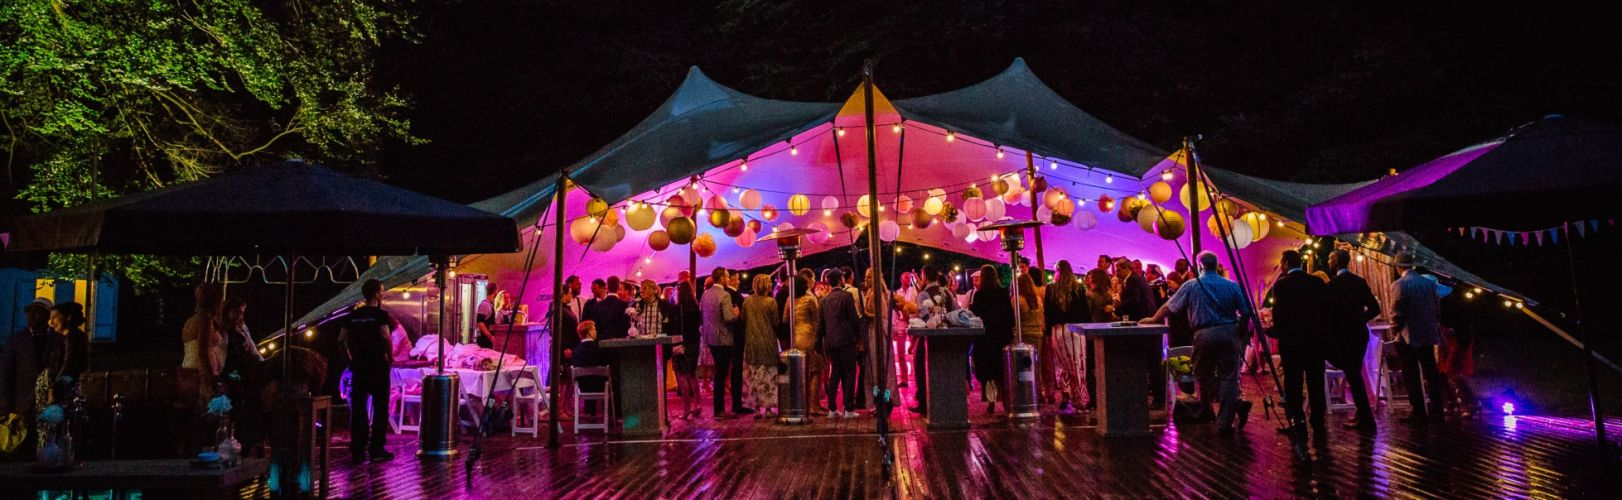 Uw Festivalbruiloft Festival Bruiloft